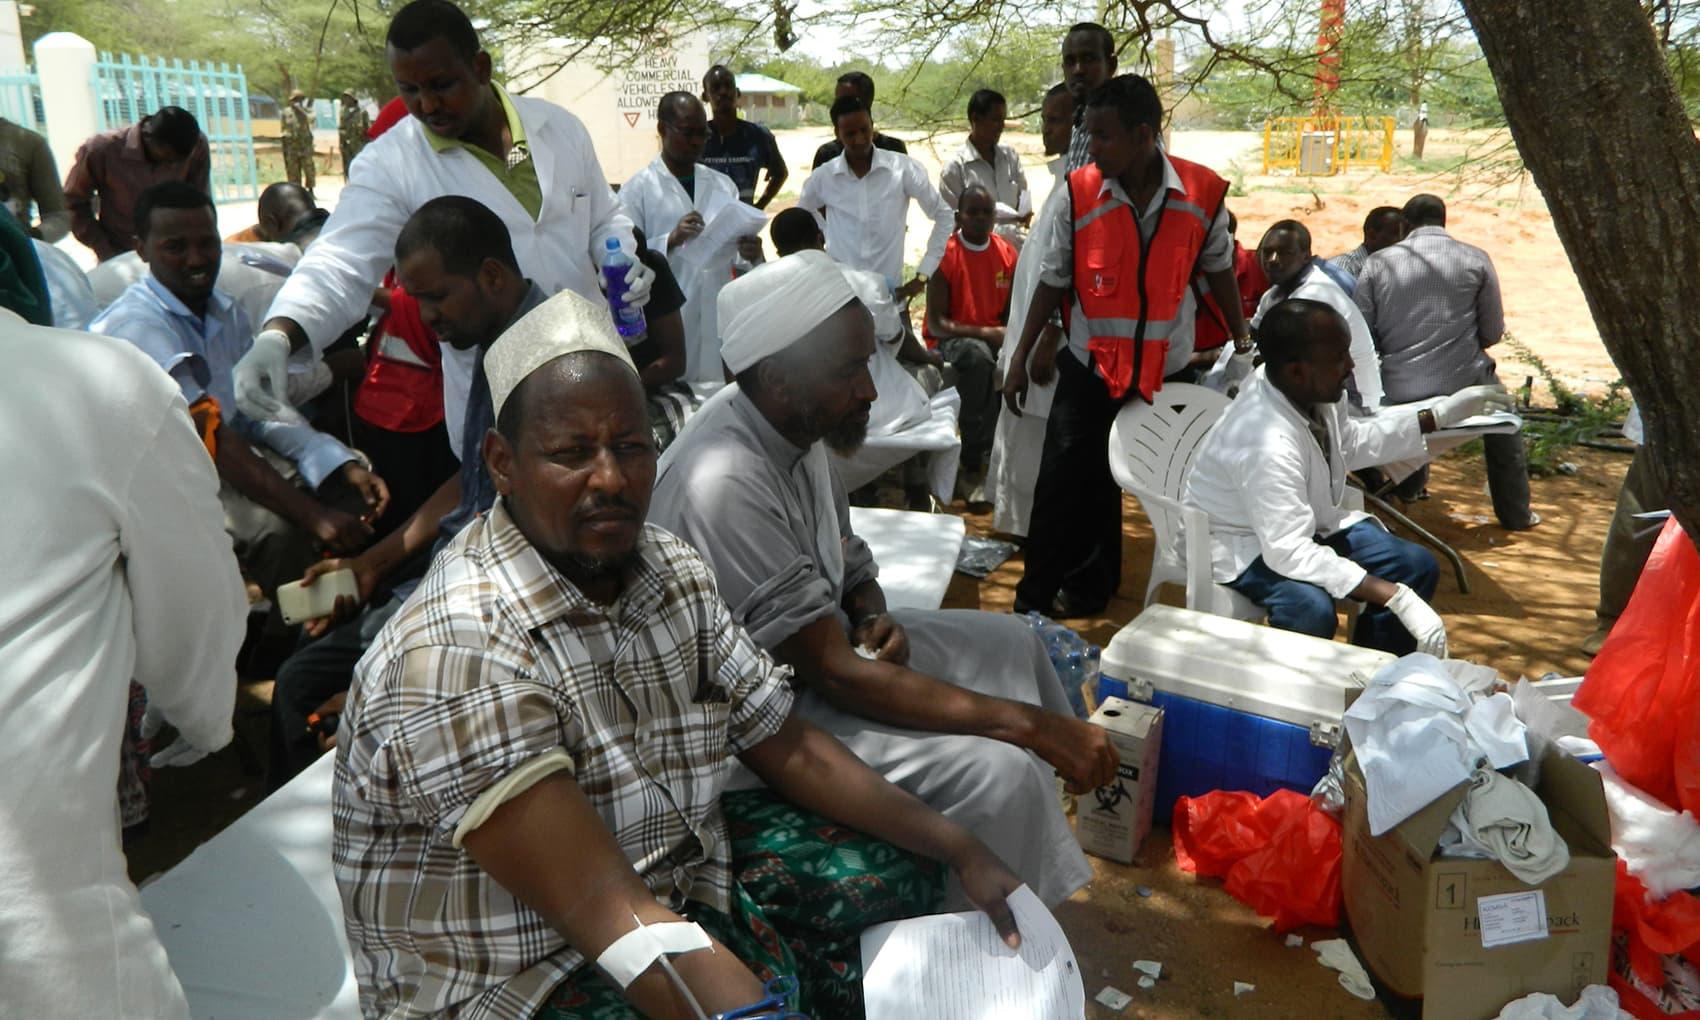 Local residents donate blood at Garissa hospital. -AP